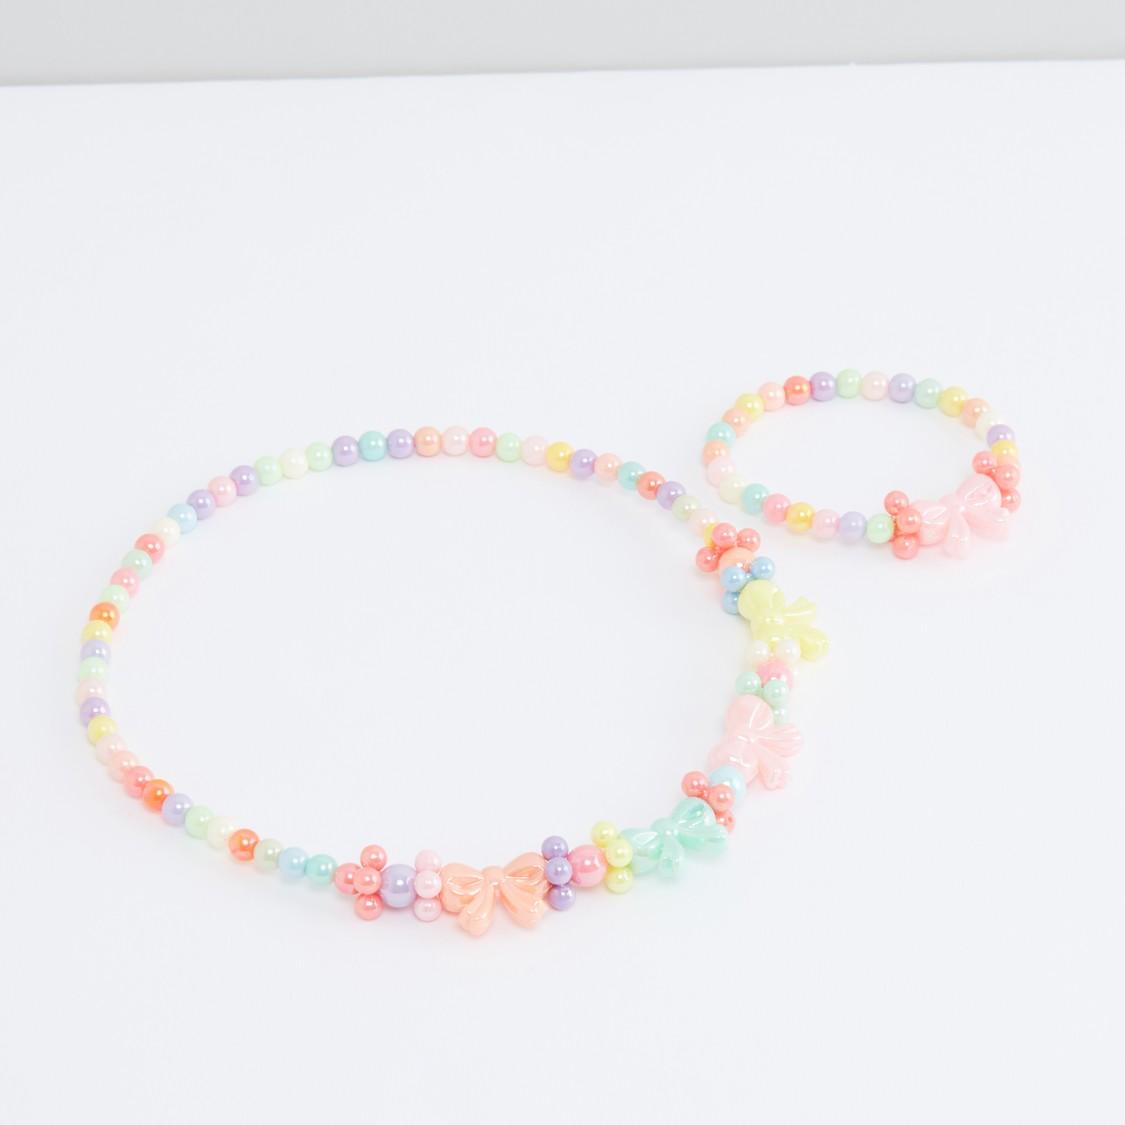 Beaded Necklace and Bracelet Set